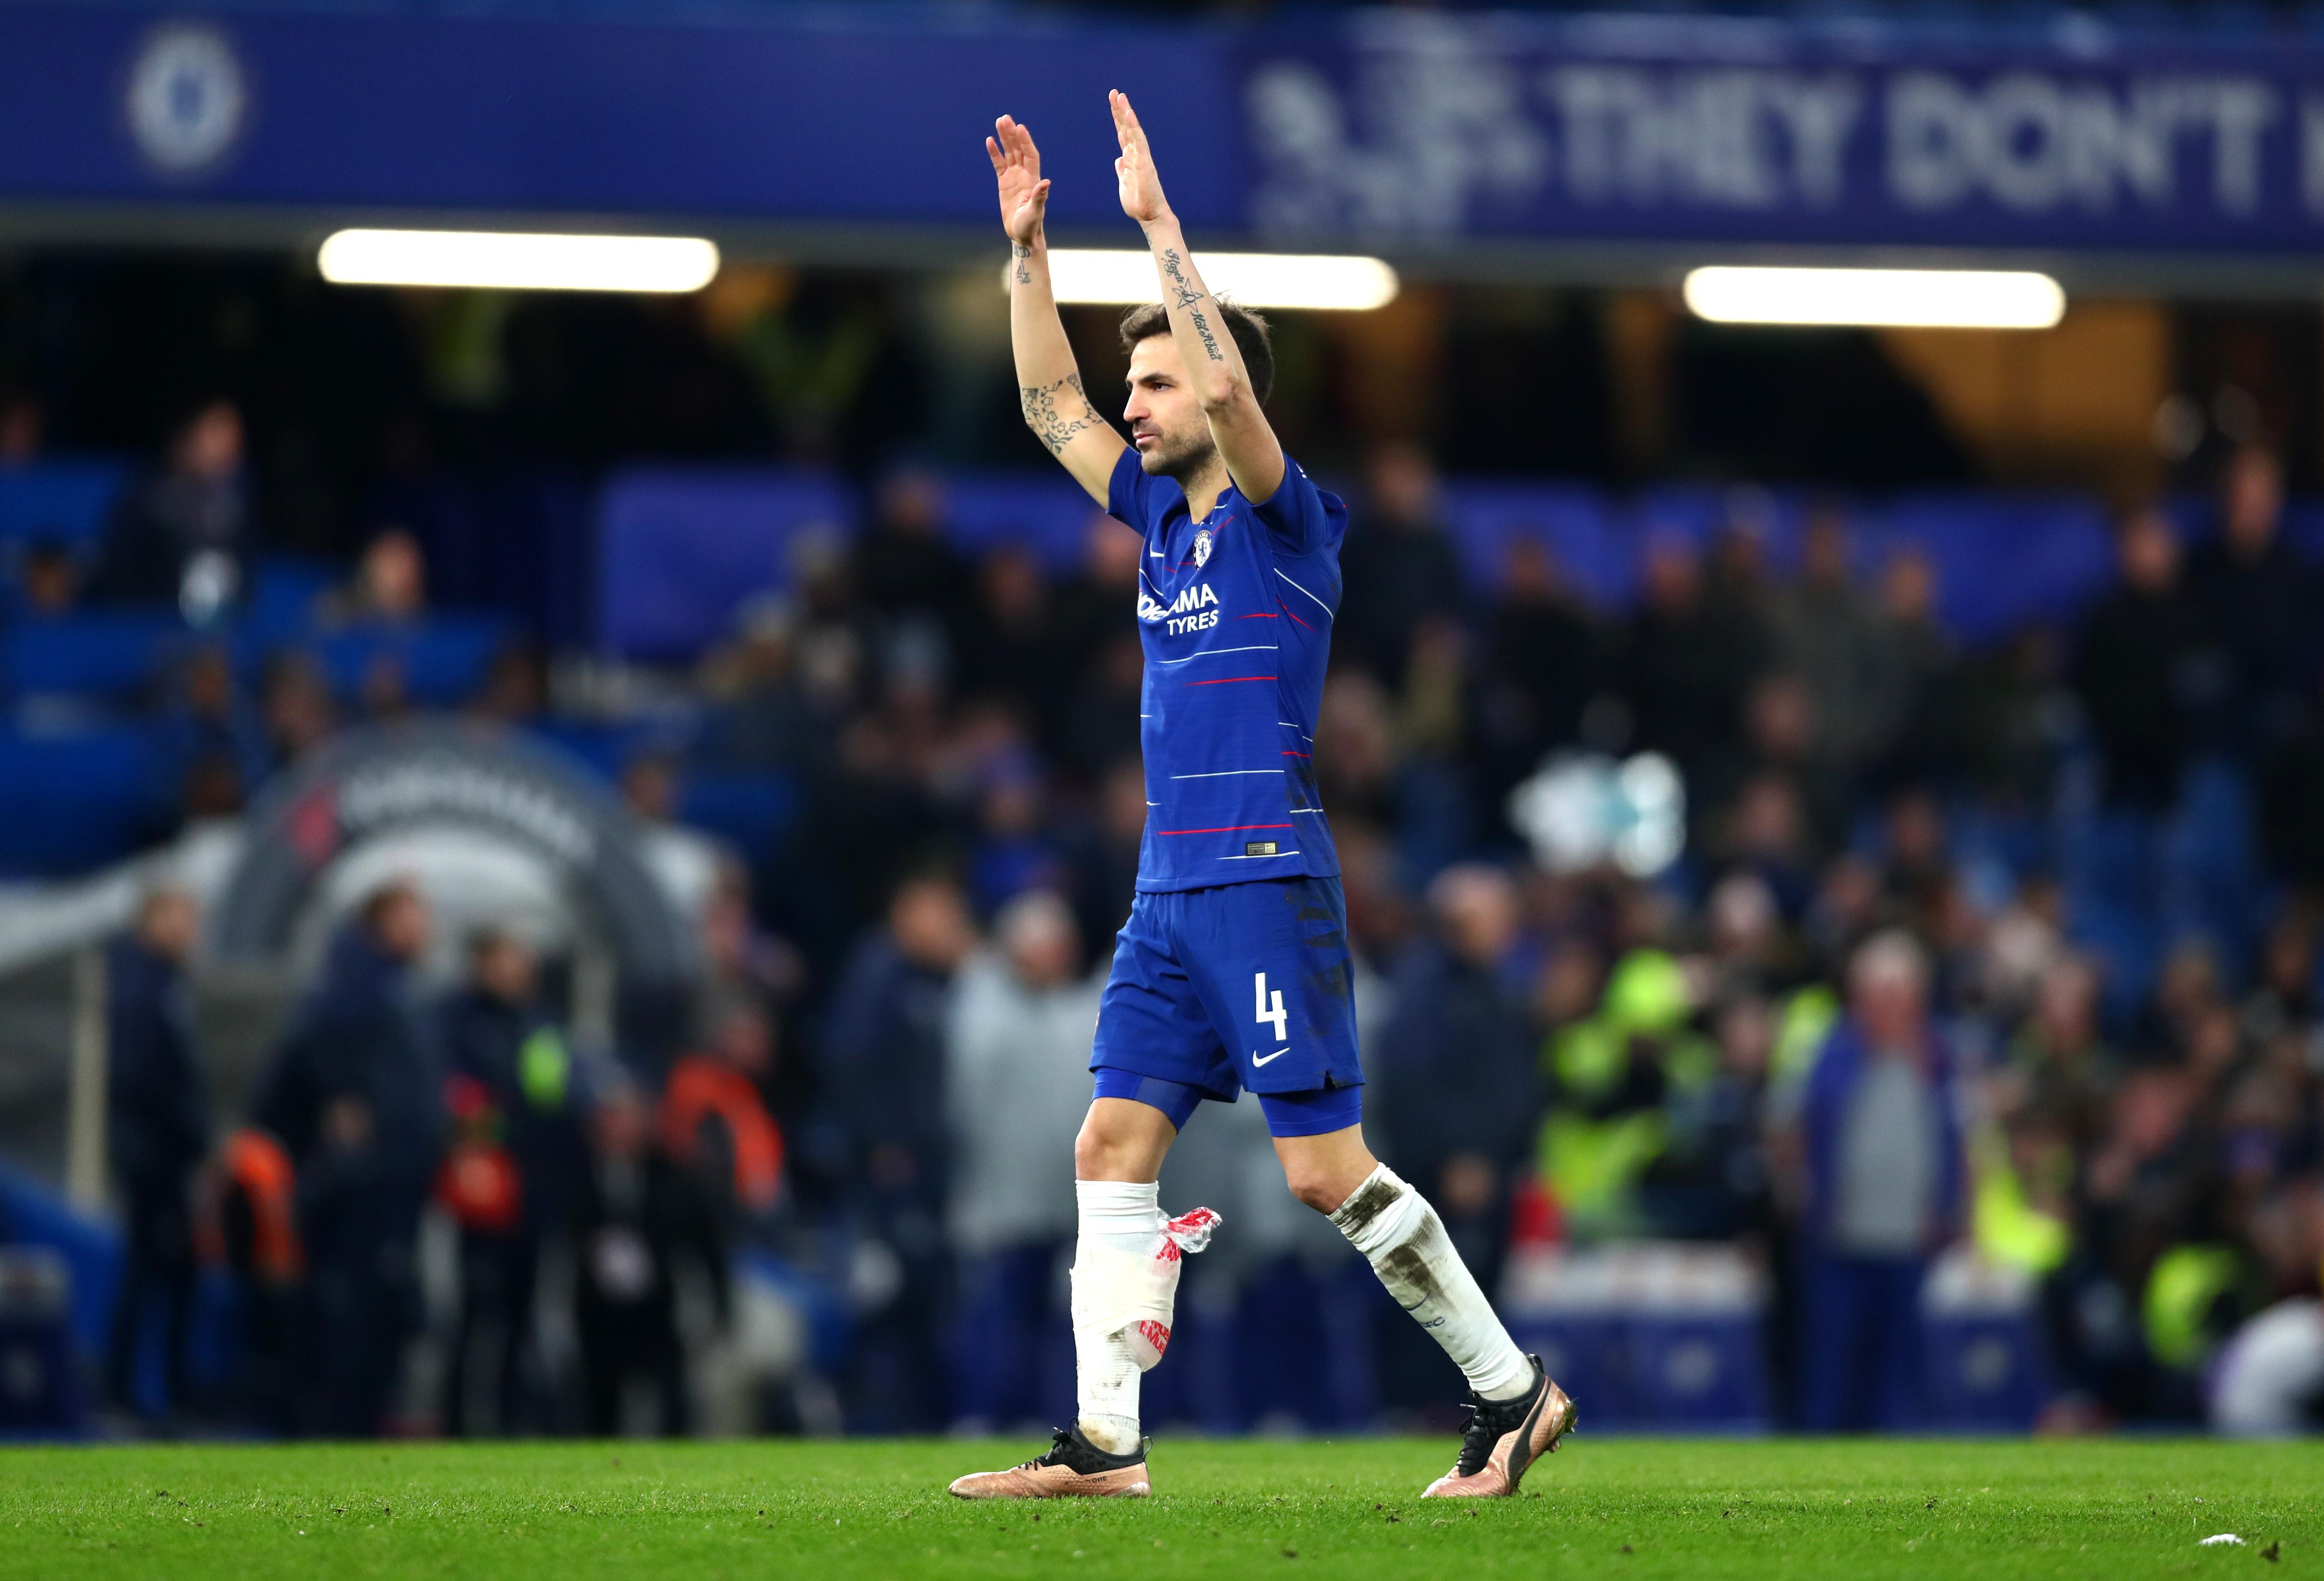 En fotos: aunque falló penal, Fábregas se despidió del Chelsea con triunfo copero